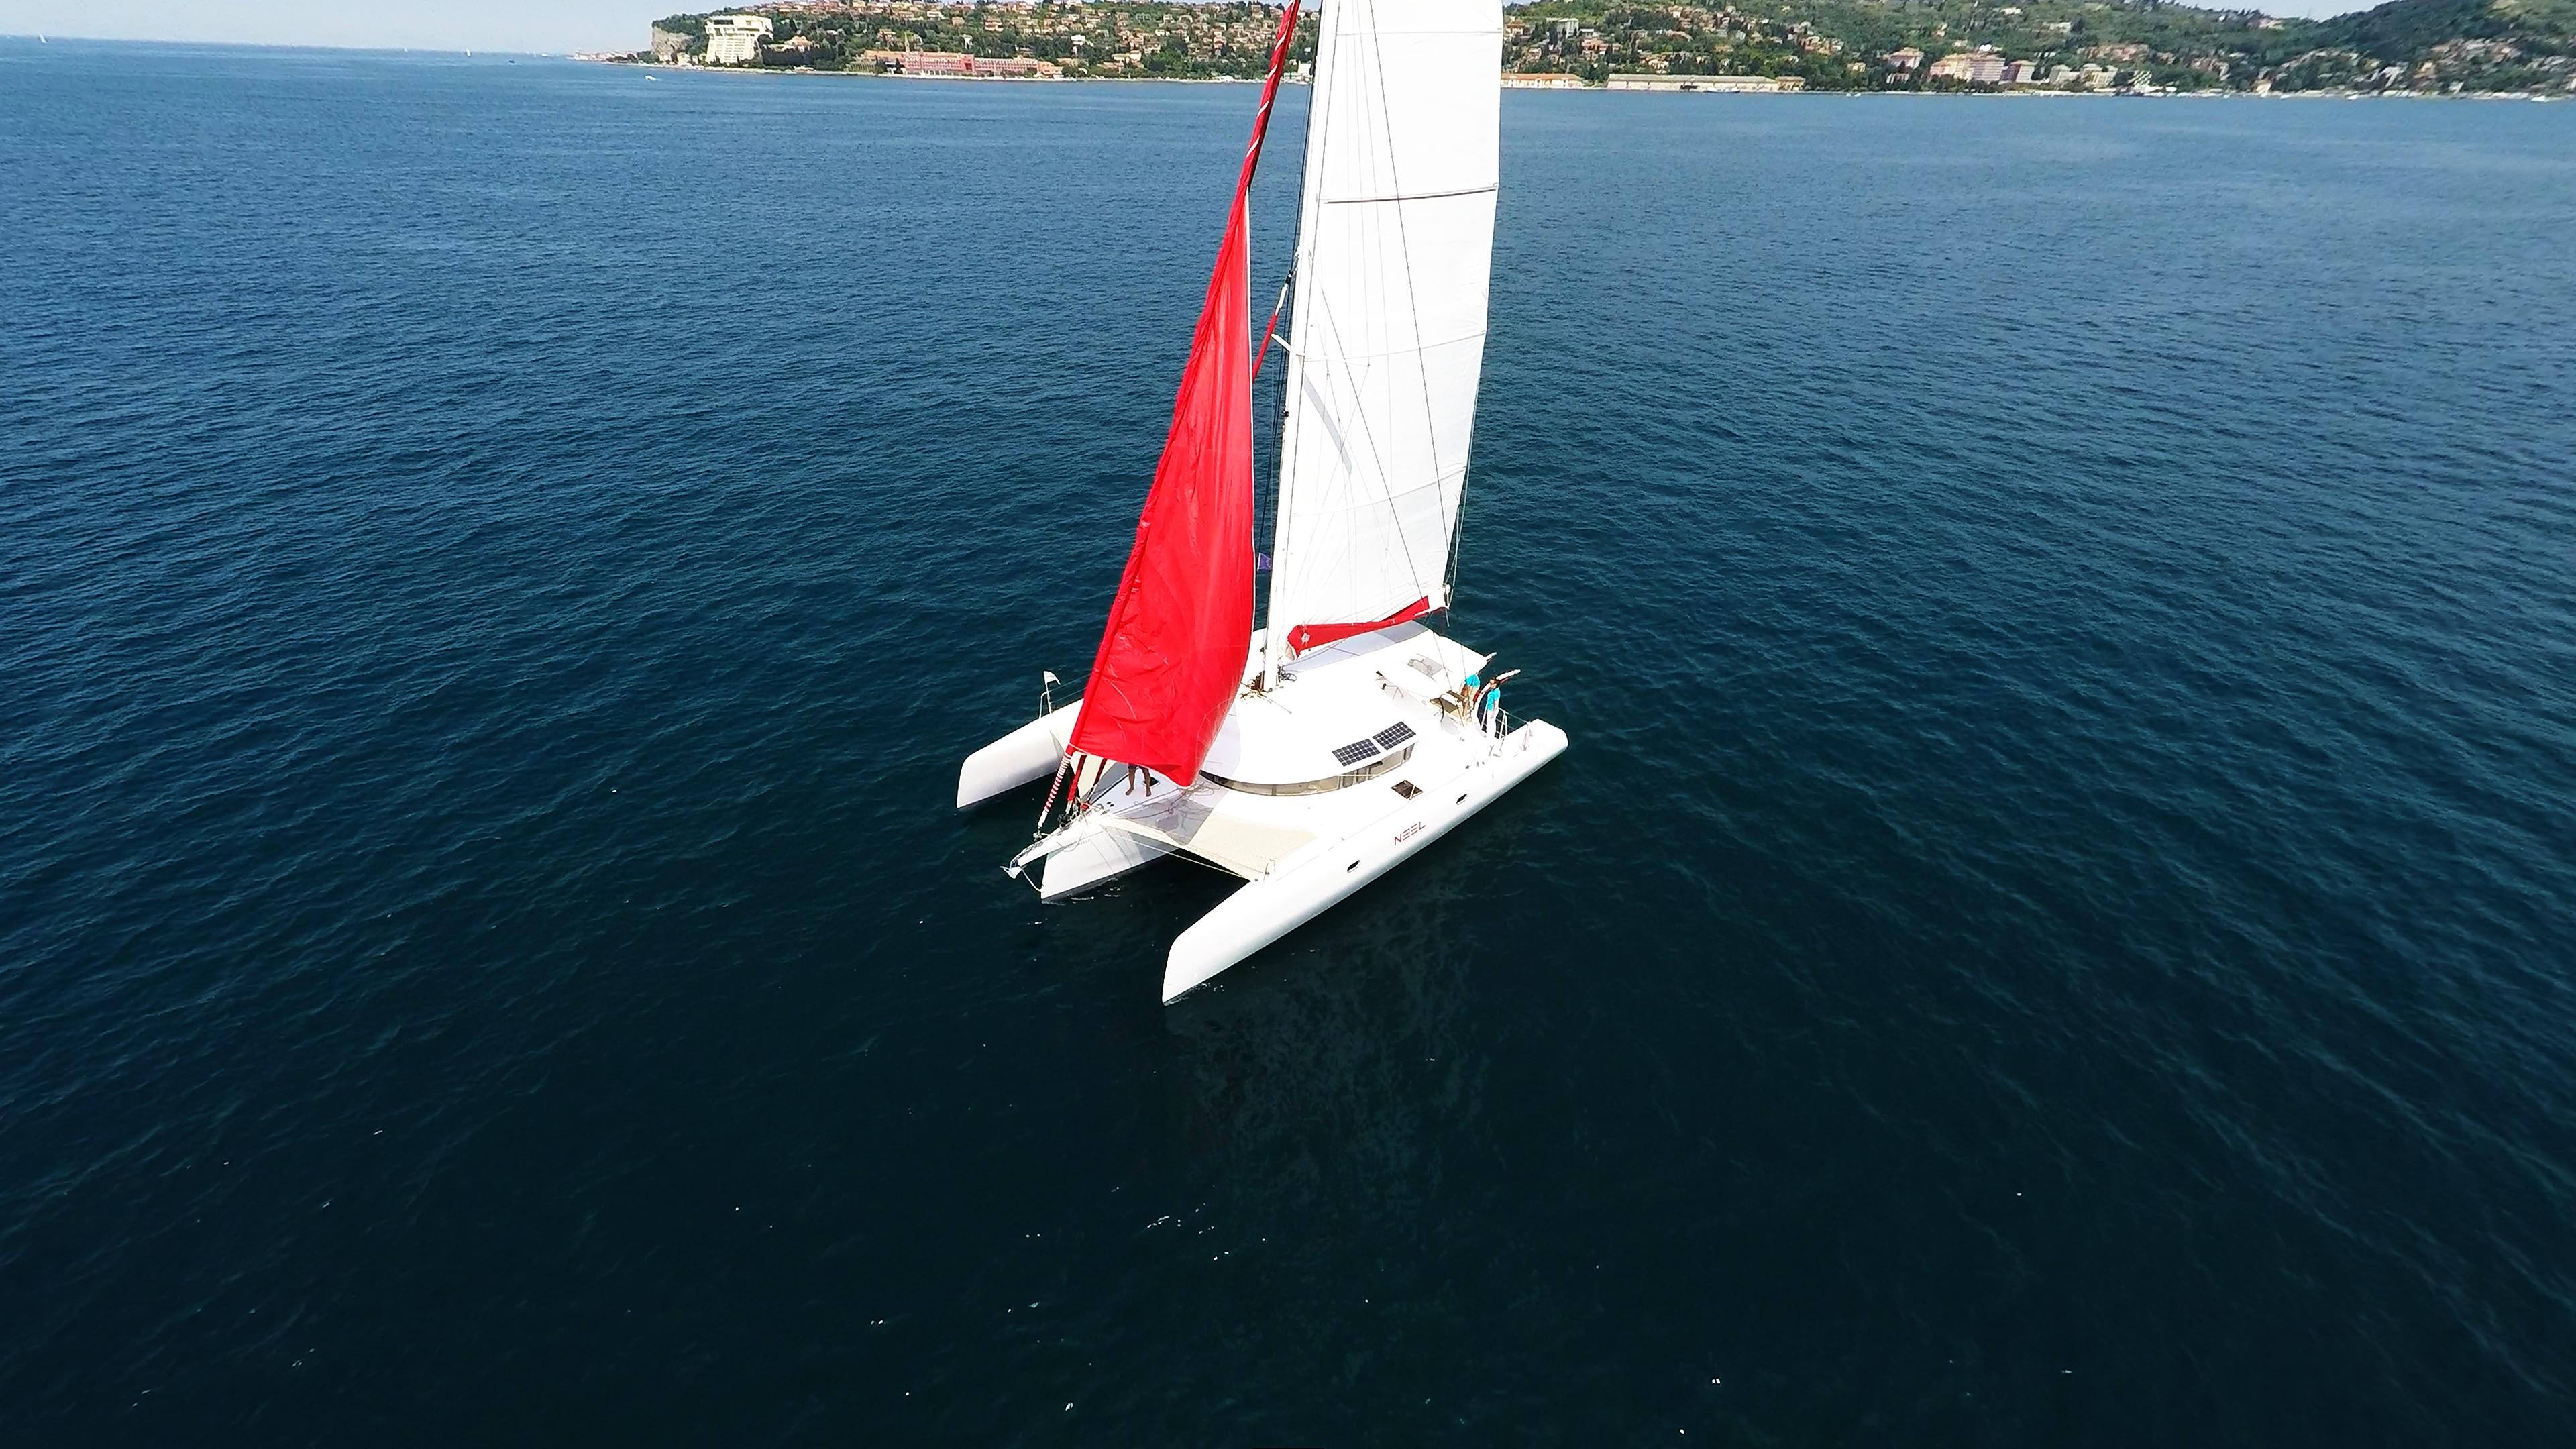 barca a vela trimarano neel 45 rosso genaker